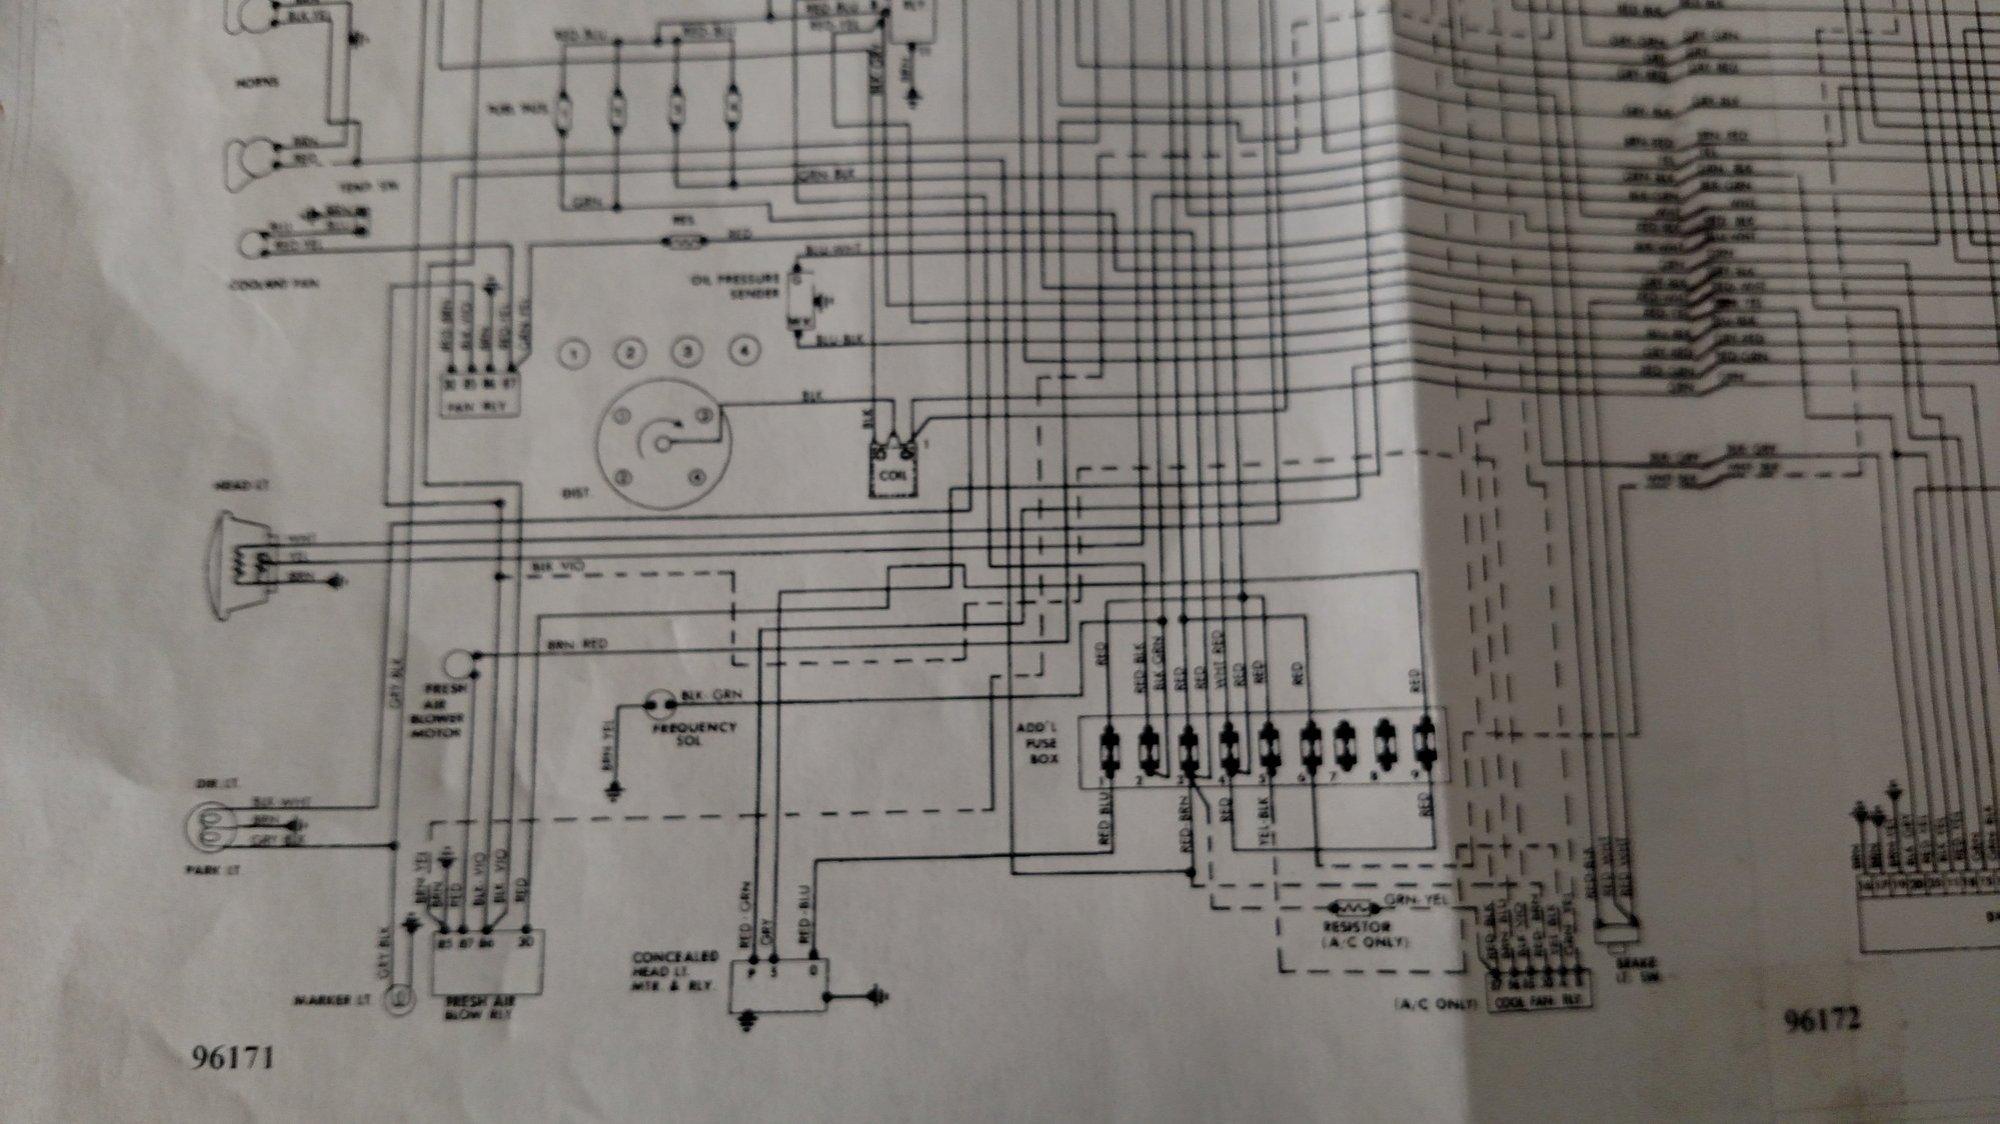 hight resolution of wrg 1669 spencer motor wiring diagram spencer motor wiring diagram